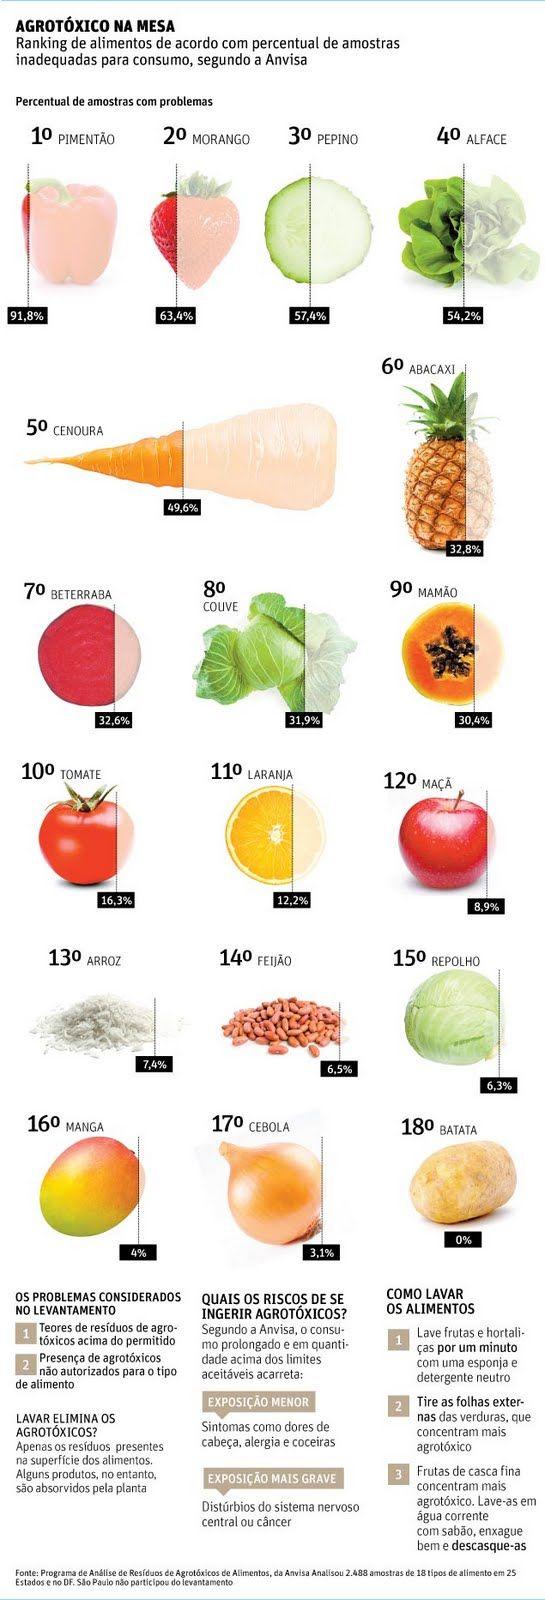 Anvisa divulga lista dos alimentos mais contaminados por agrotóxicos - Reclame…